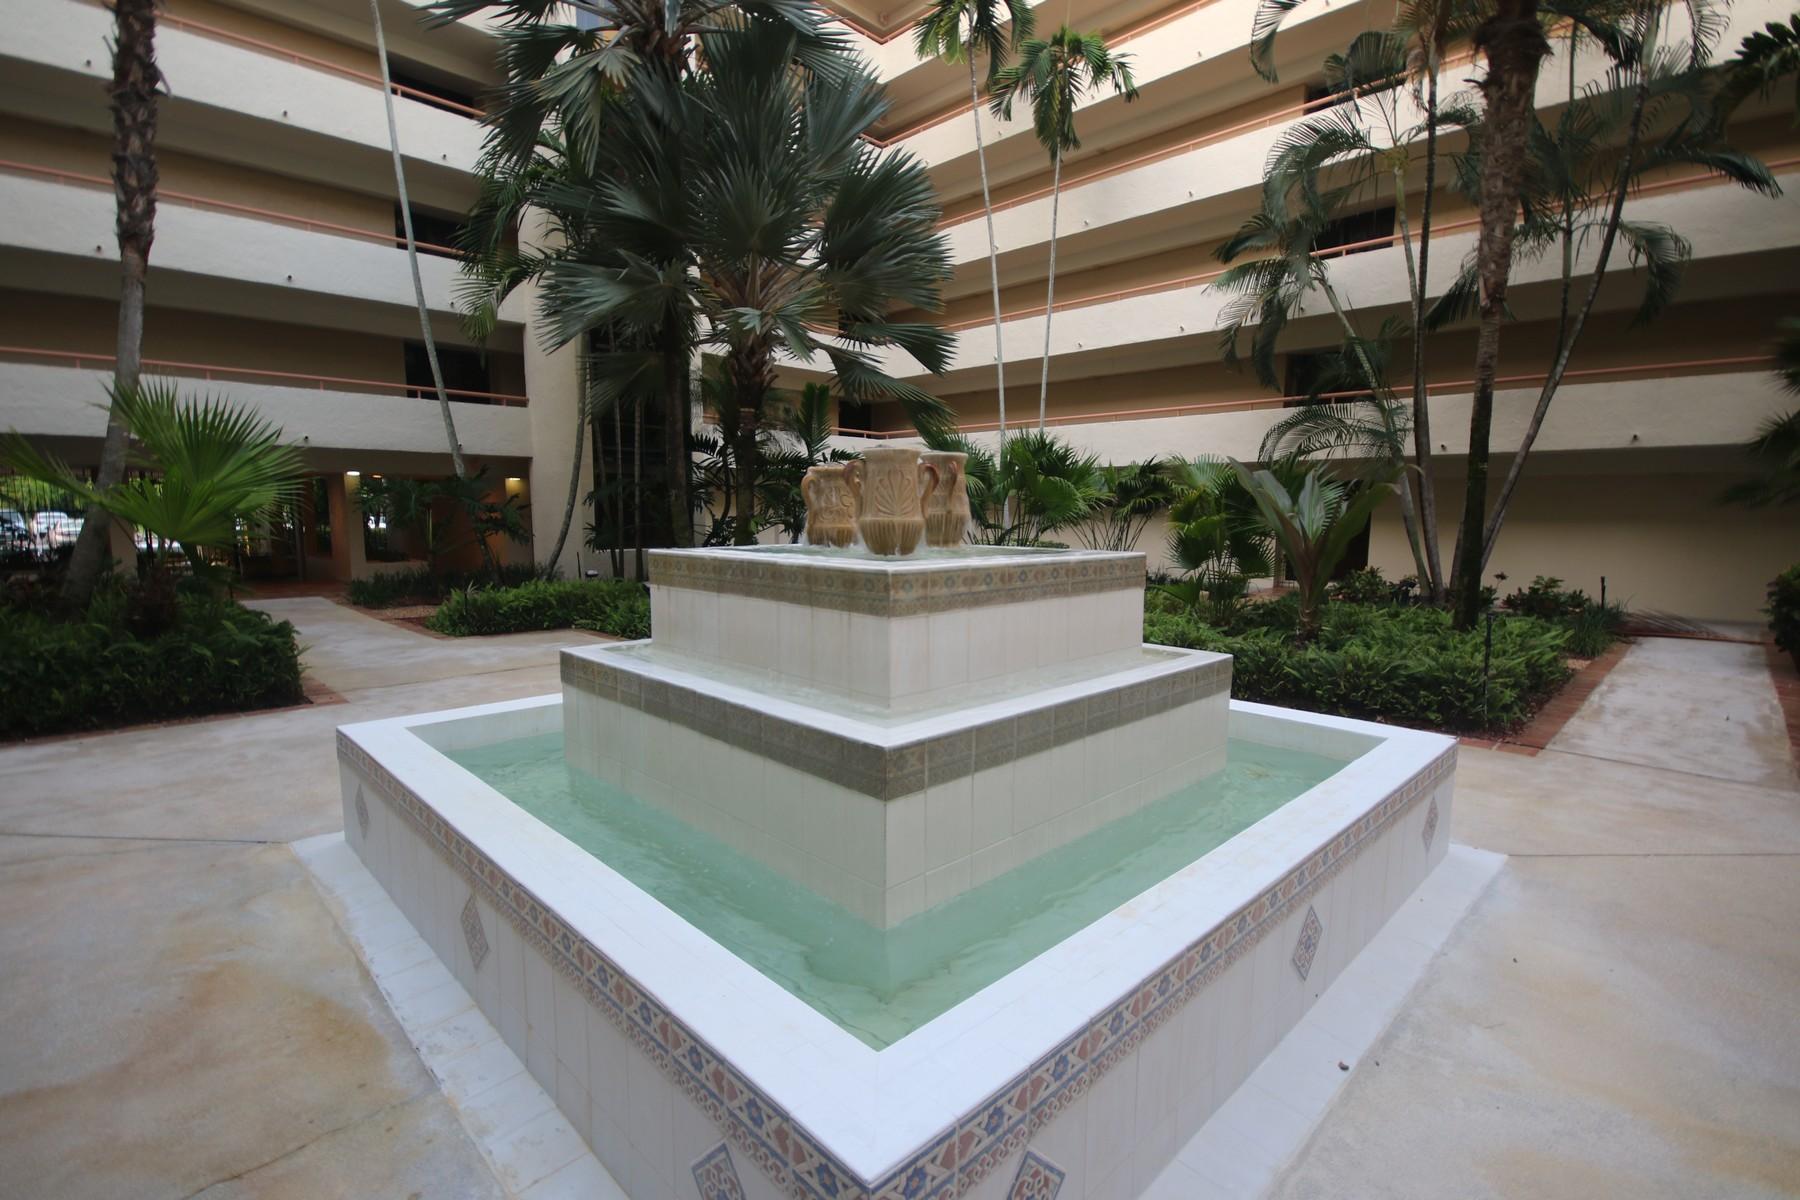 Additional photo for property listing at 23200 Camino Del Mar , 605, Boca Raton, FL 33433 23200  Camino Del Mar 605 Boca Raton, Florida 33433 Estados Unidos